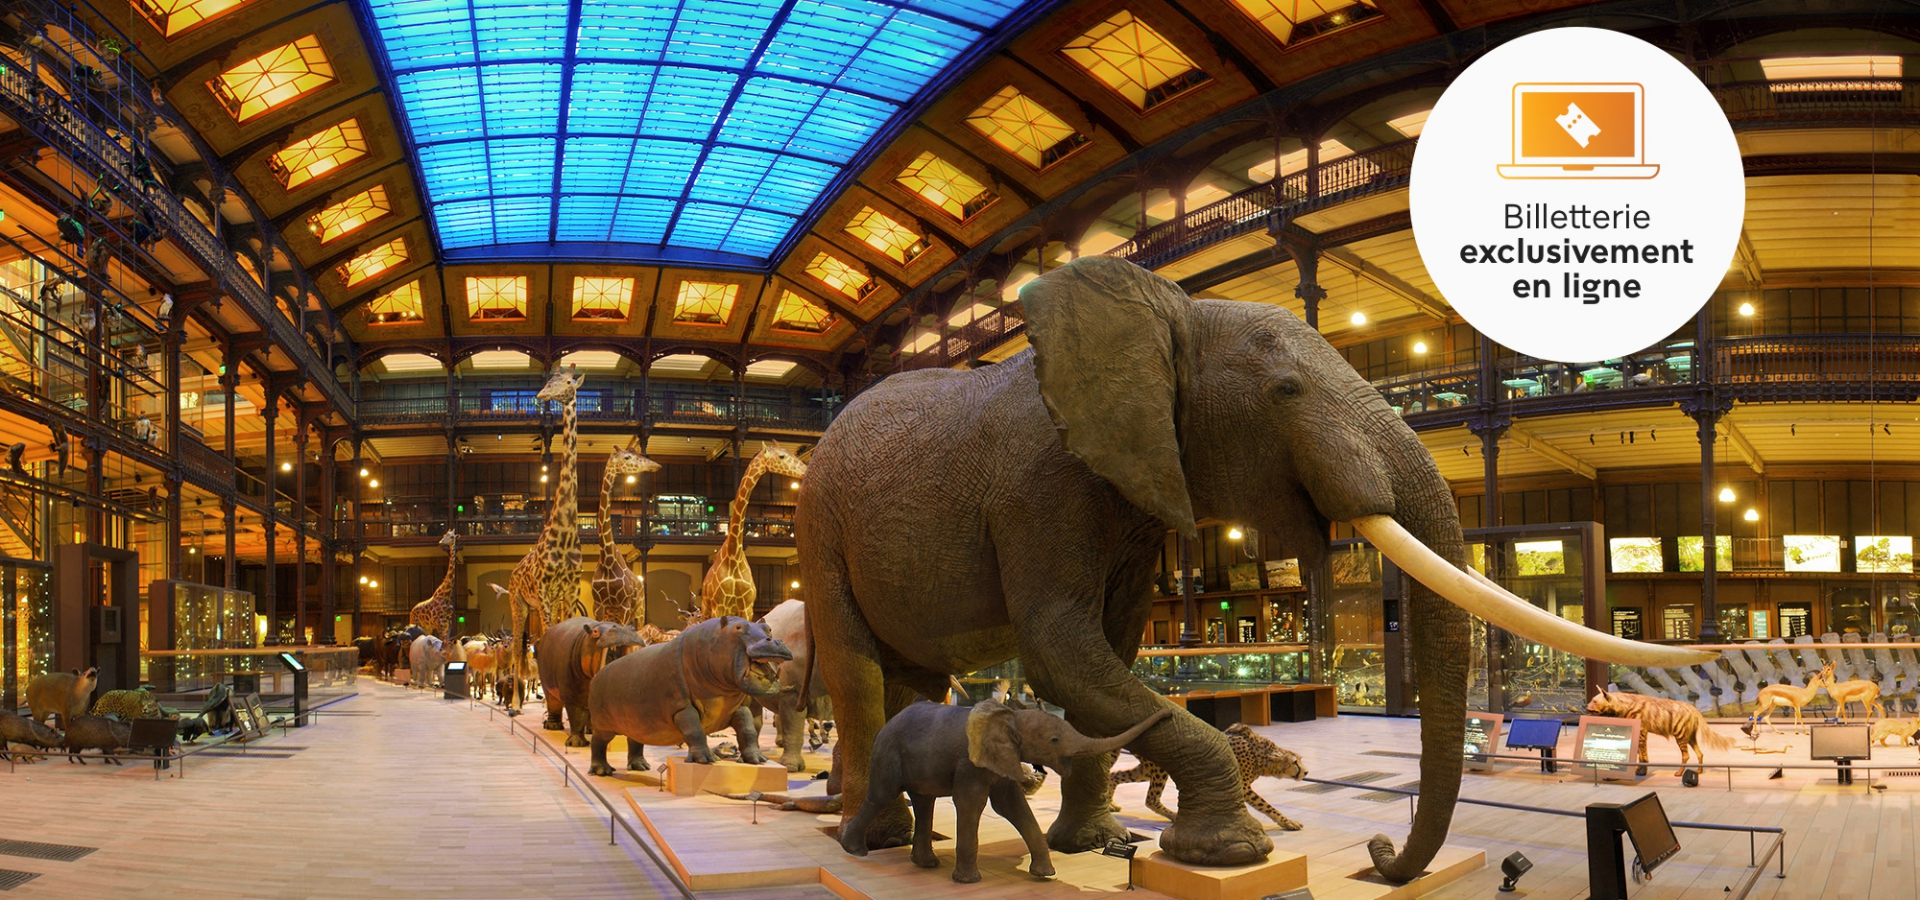 Caravane africaine, Grande Galerie de l'Evolution © MNHN – Bruno Jay